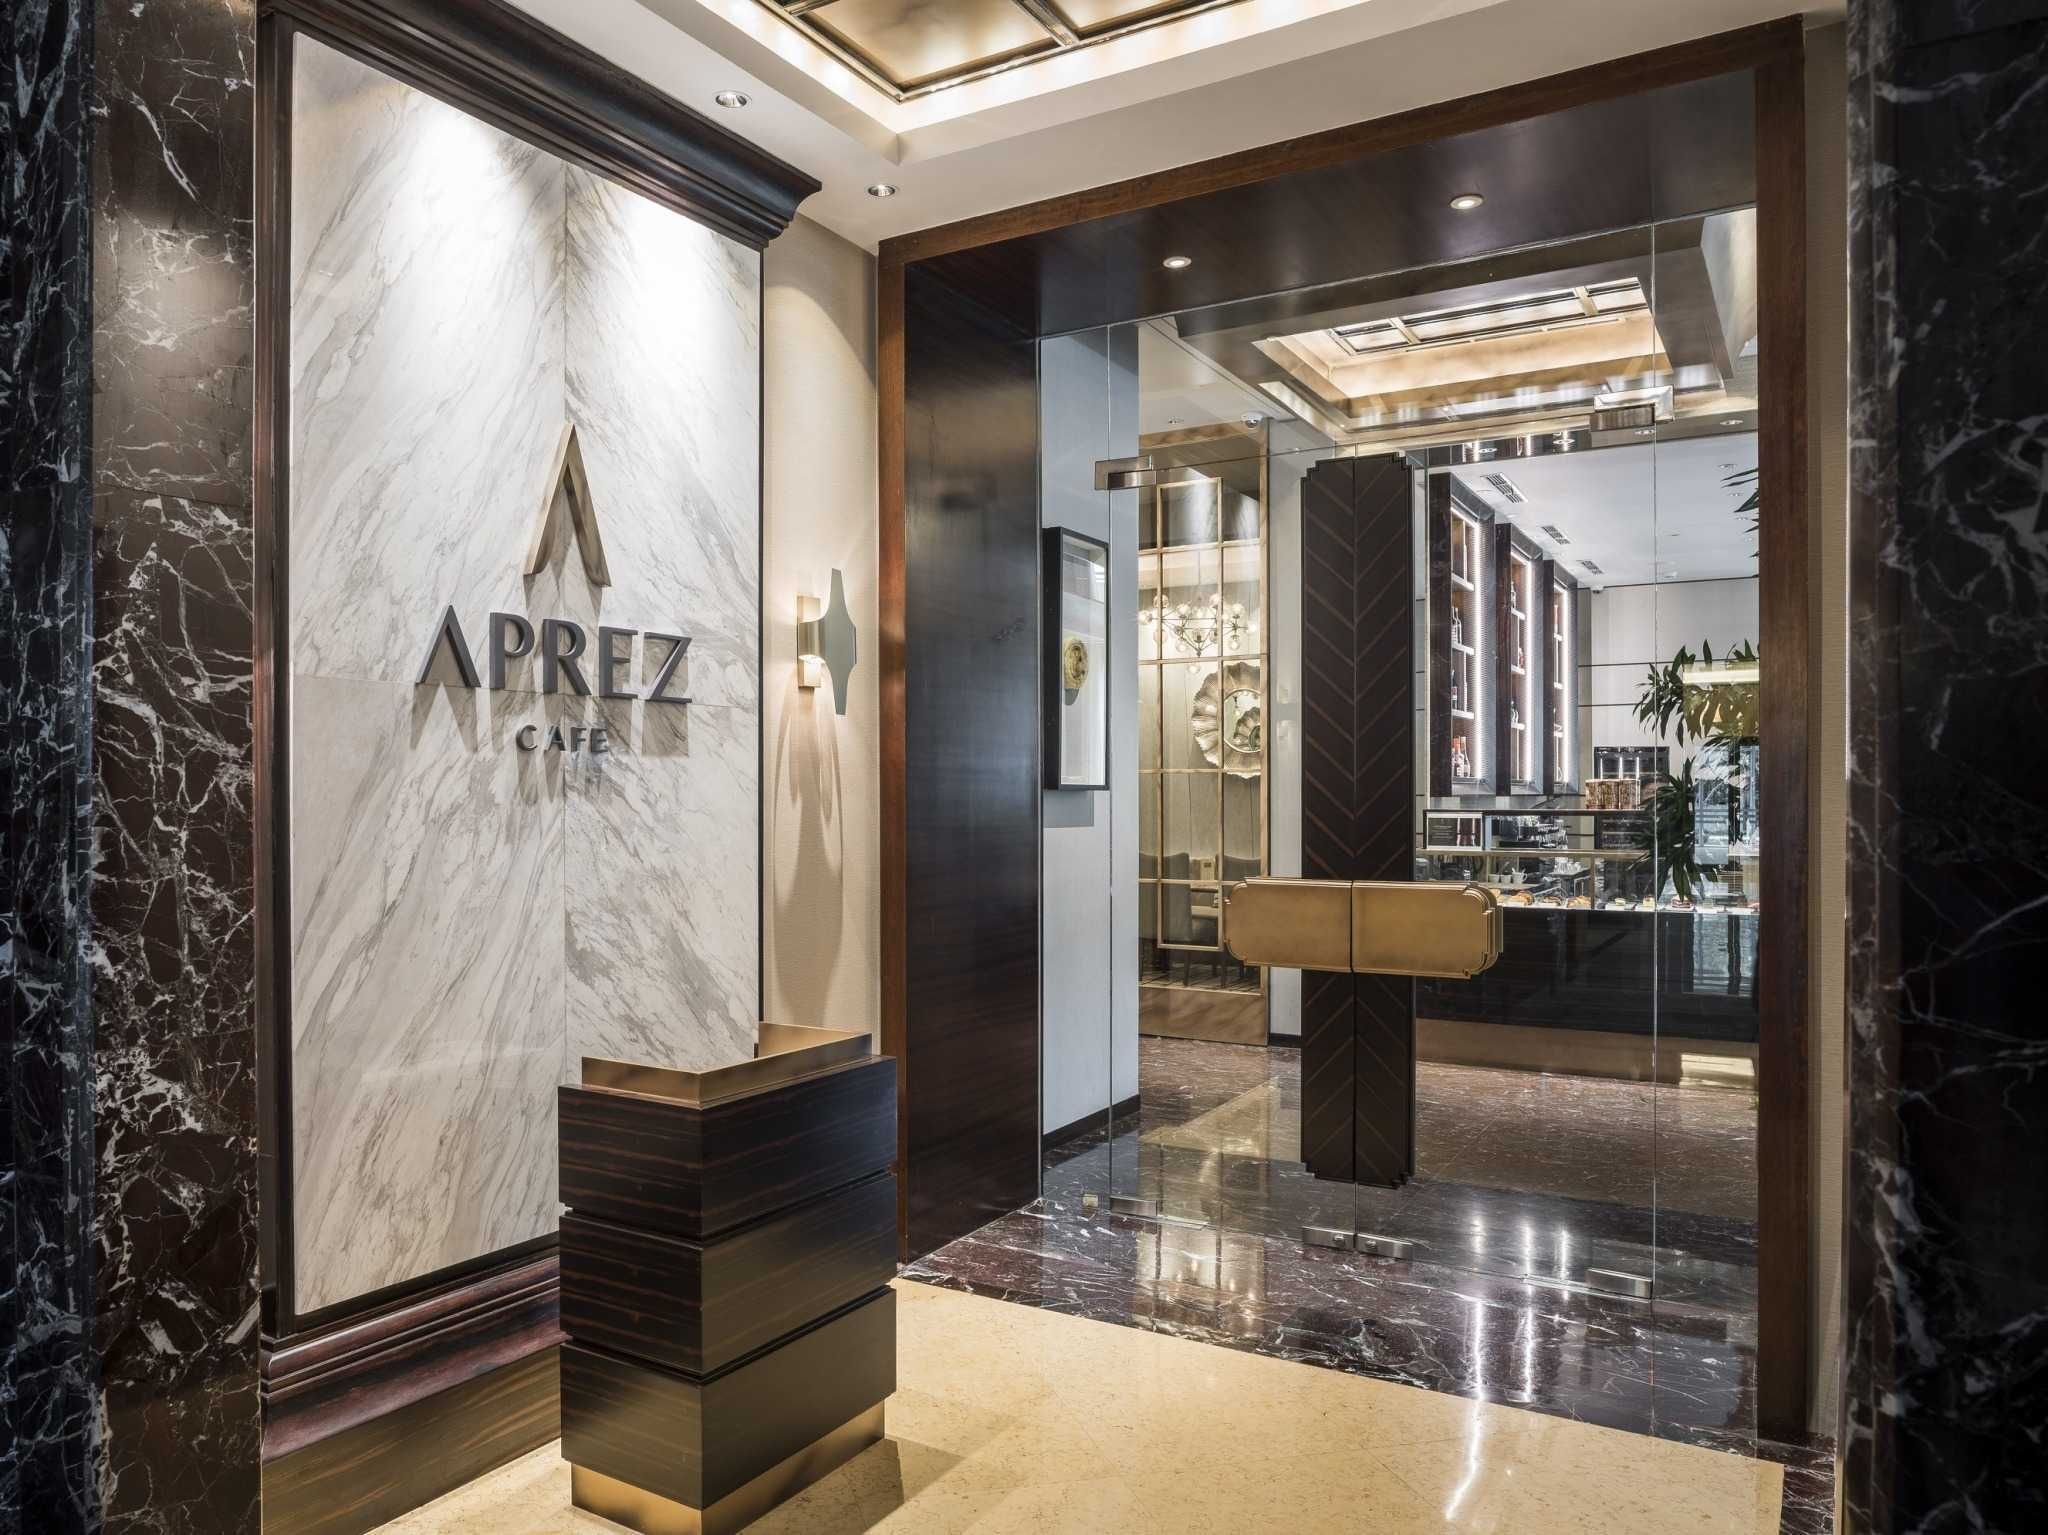 Vin•da•te The Aprez Cafe - Pakubuwono Jakarta-Indonesia Jakarta-Indonesia Entrance Door Contemporary  15786